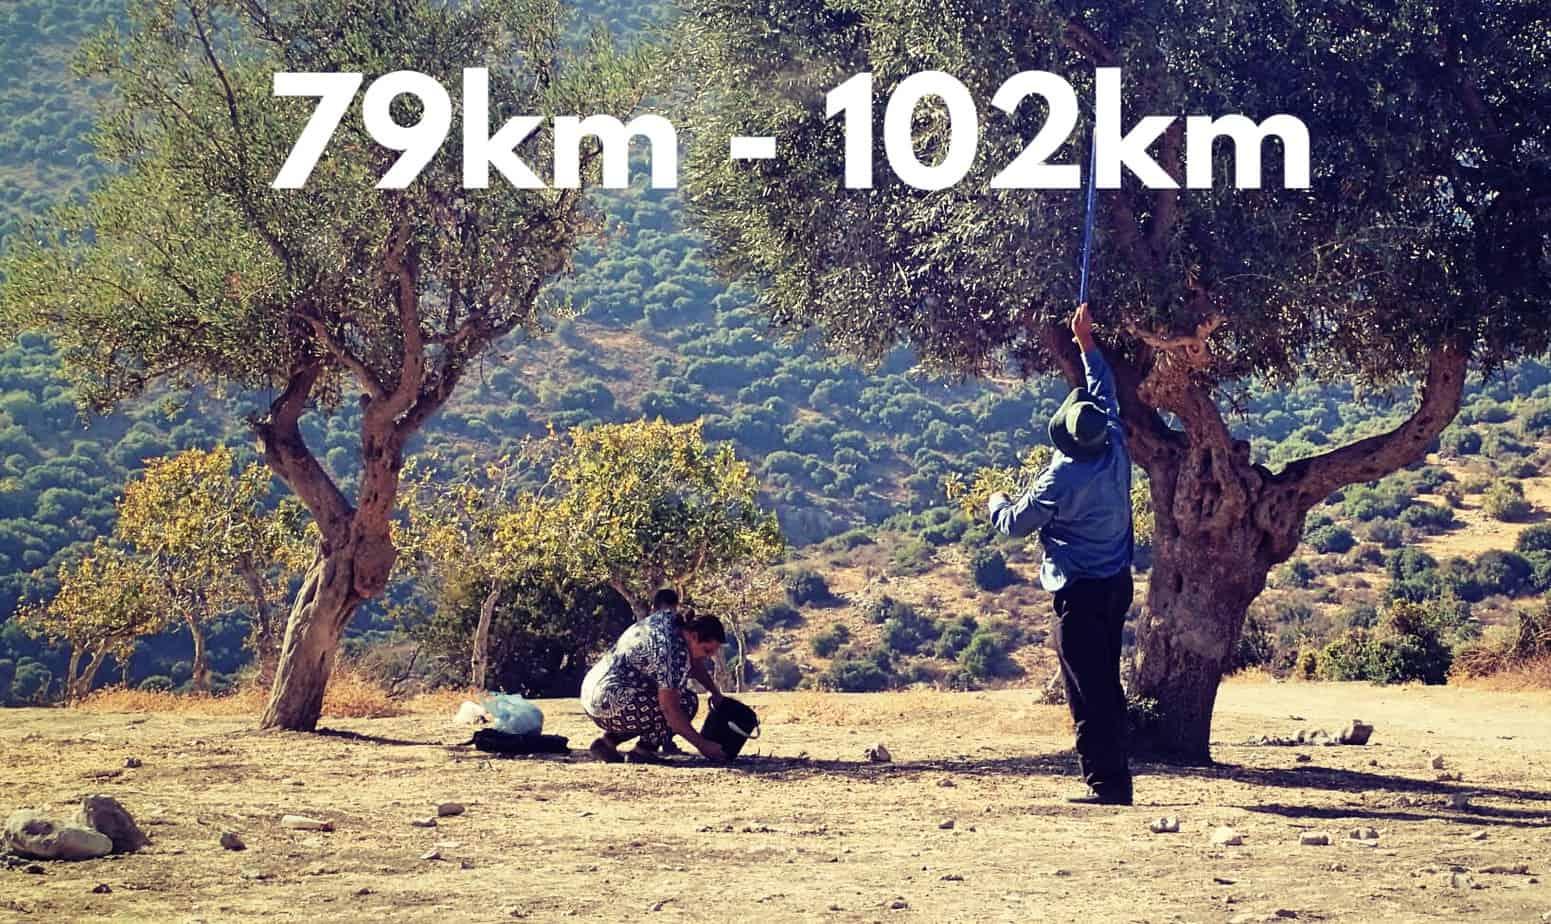 79-102km